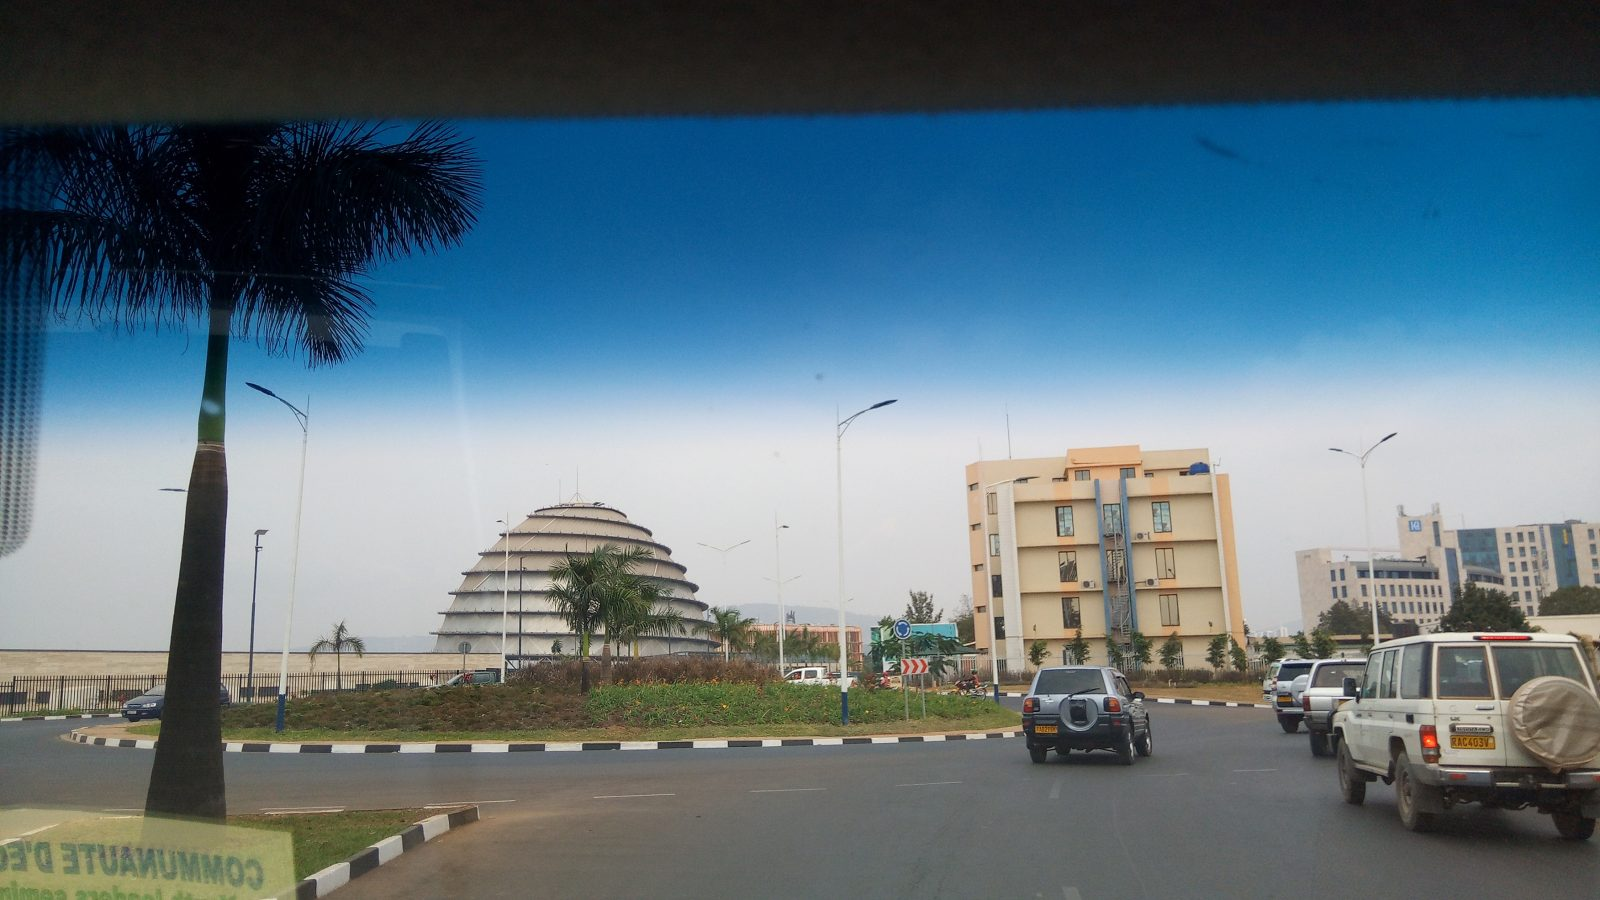 Le centre de conférence de Kigali - Photo : Roger Mawulolo